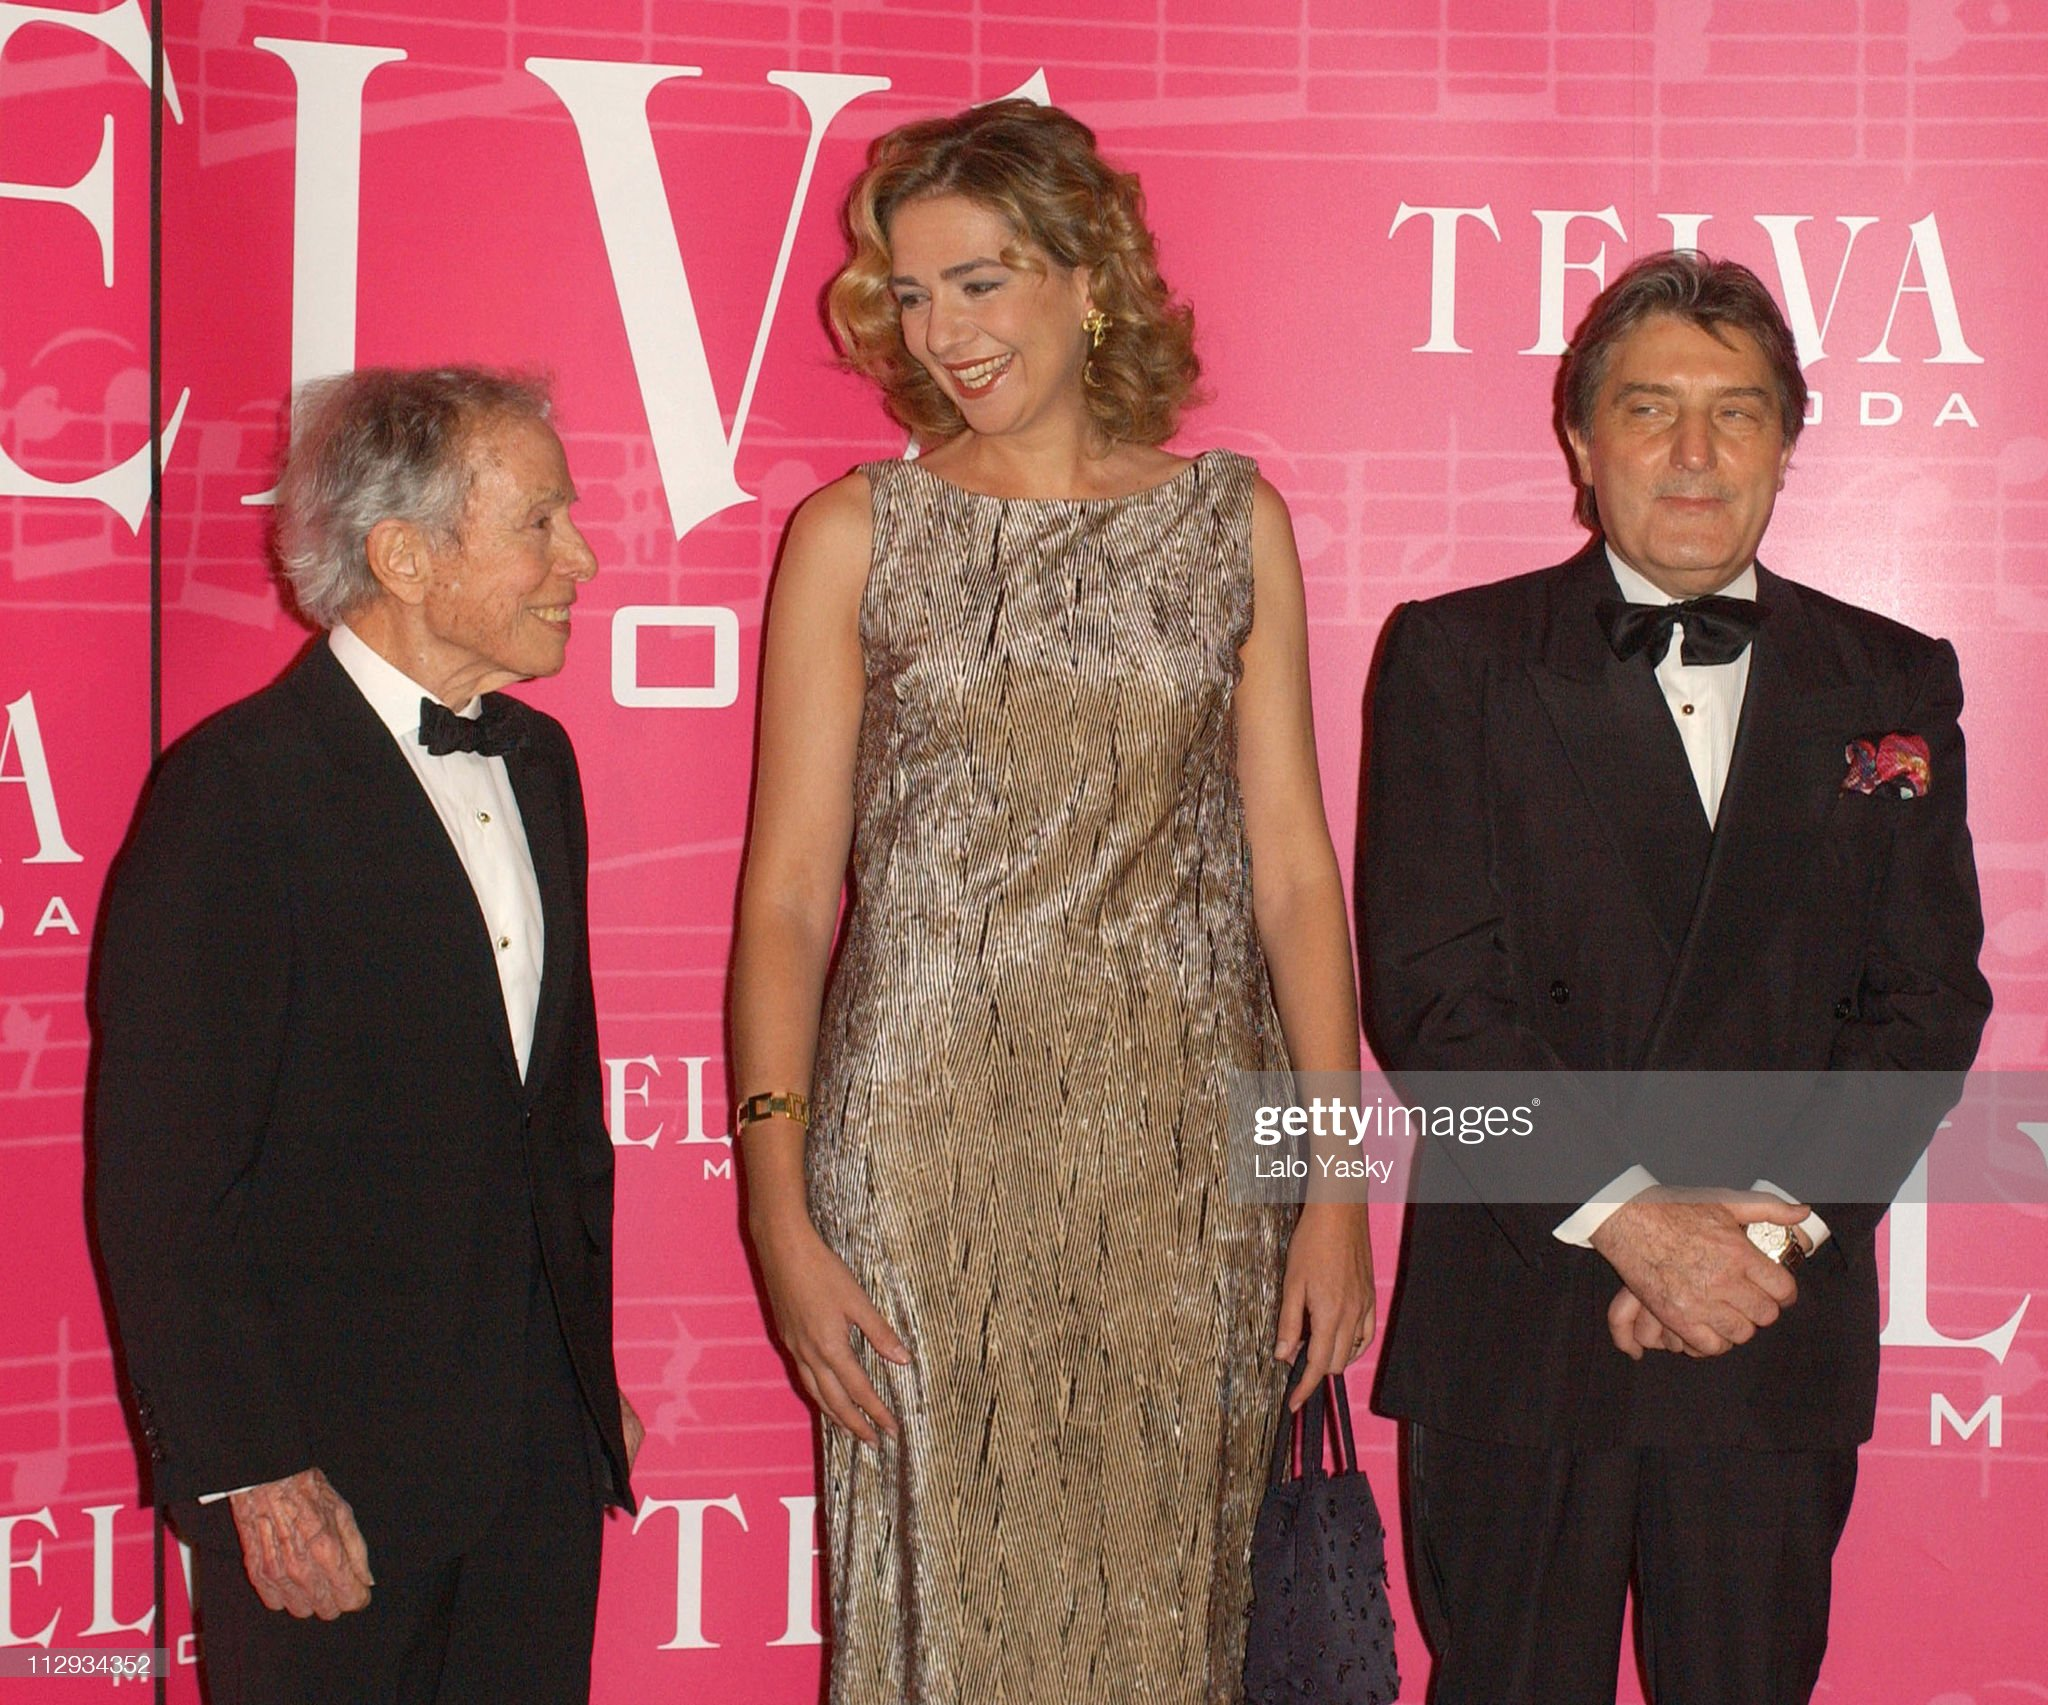 2002 Telva Awards Honors Emanuelle Ungaro and Manuel Pertegaz : News Photo